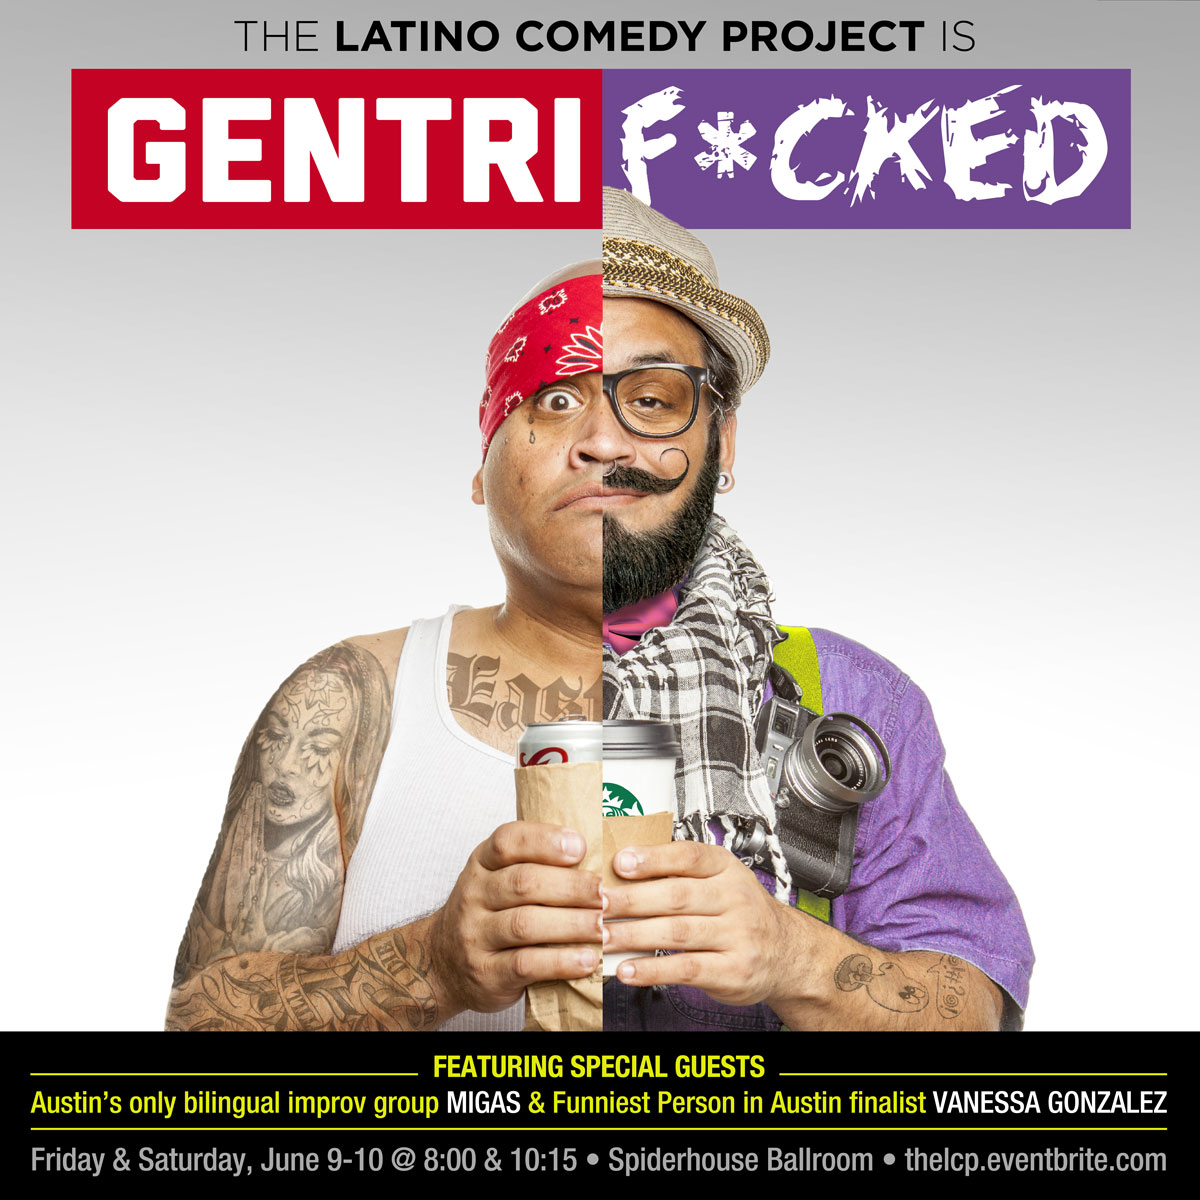 Latino Comedy Project Presents